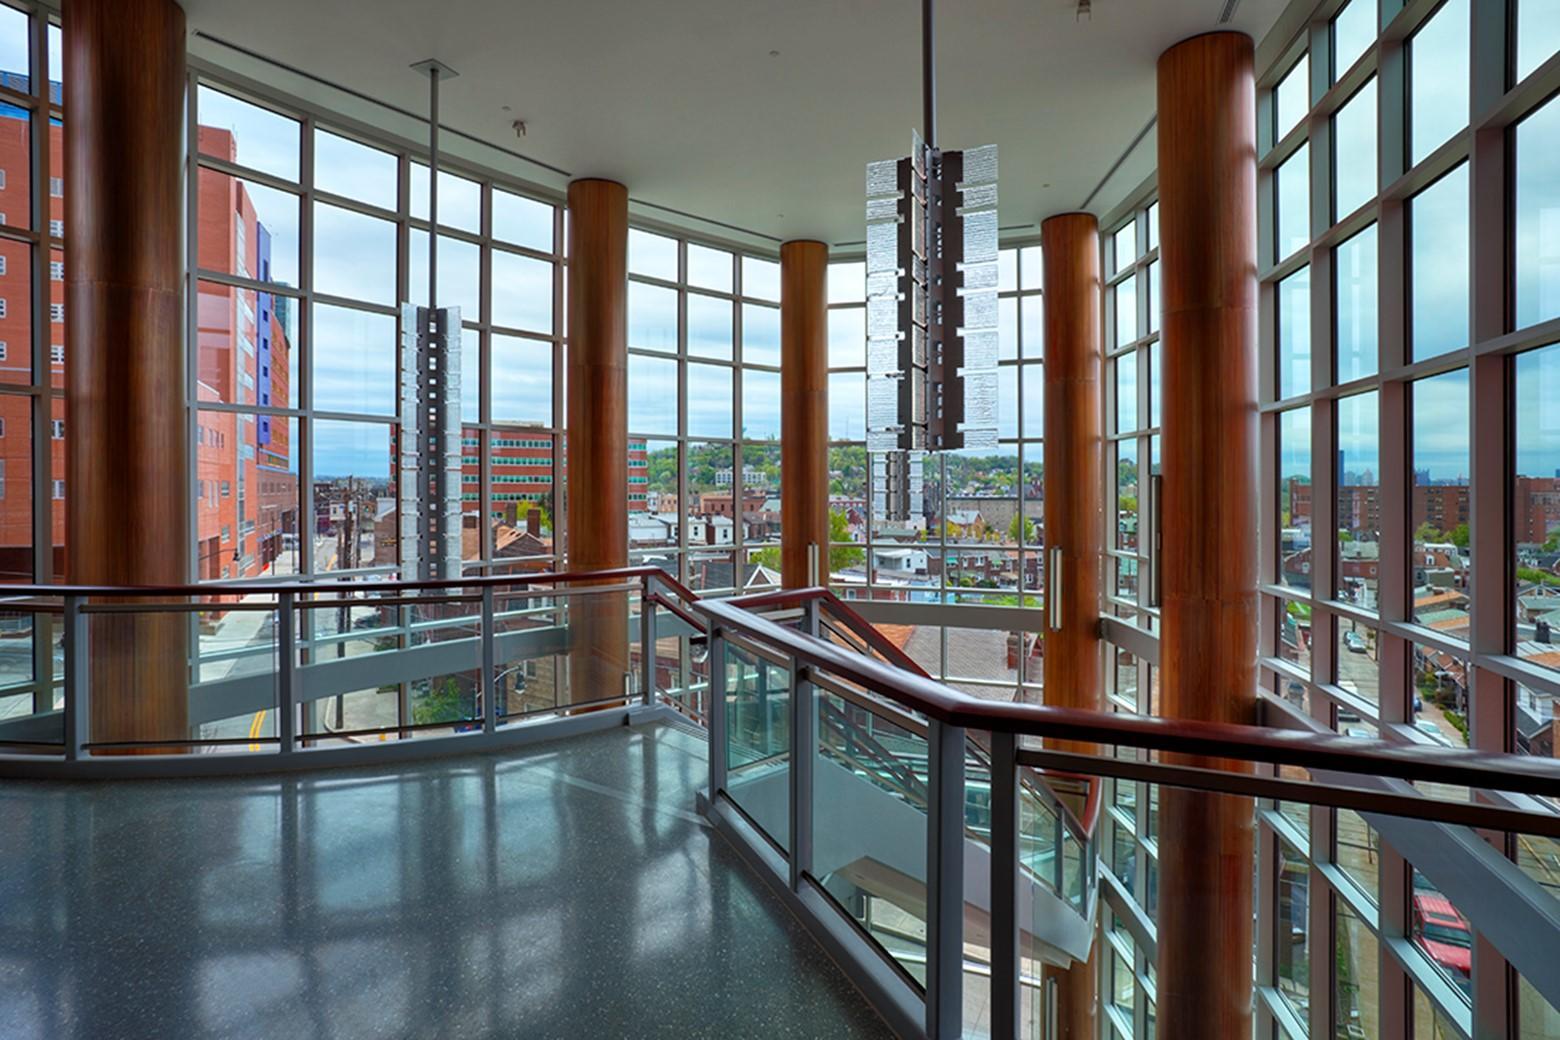 Vitro Architectural Glass Launches Titan Oversized Glass